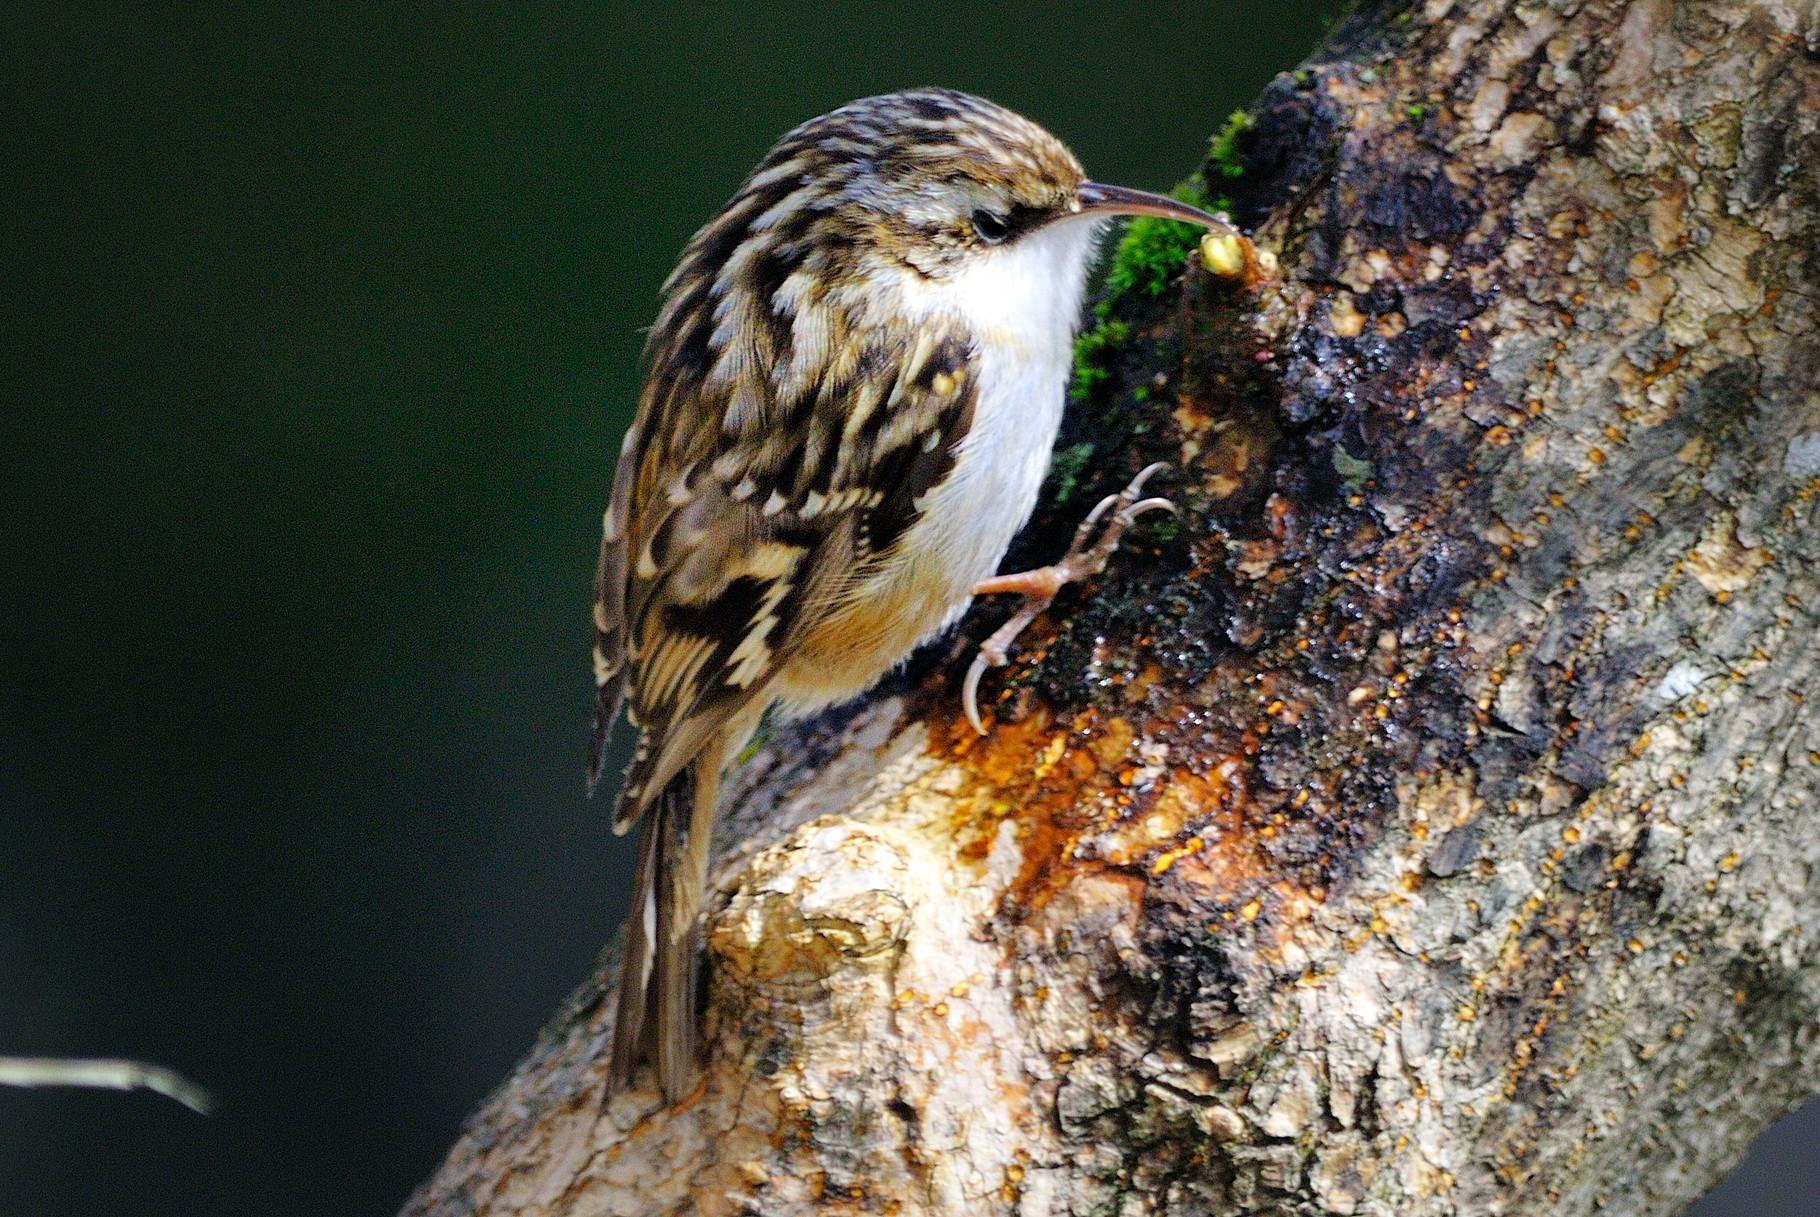 _DSC3238 Grimpereau des bois-Certhia familiaris - Eurasian Treecreeper